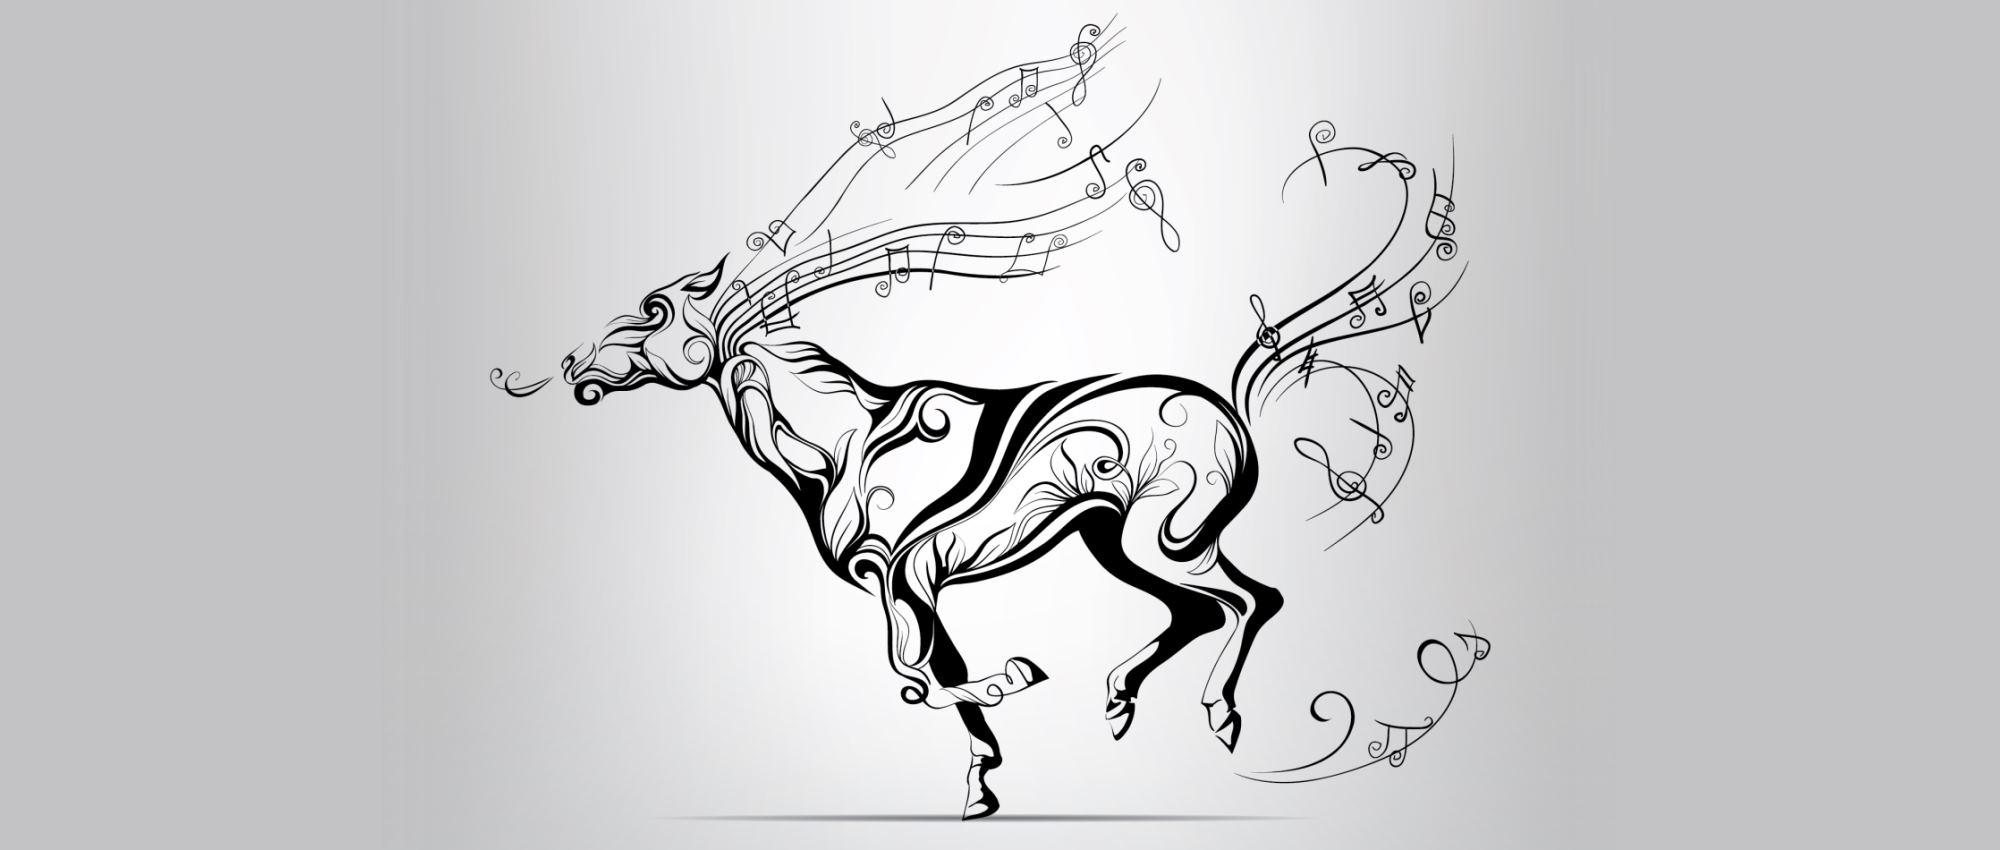 music-horse.jpg